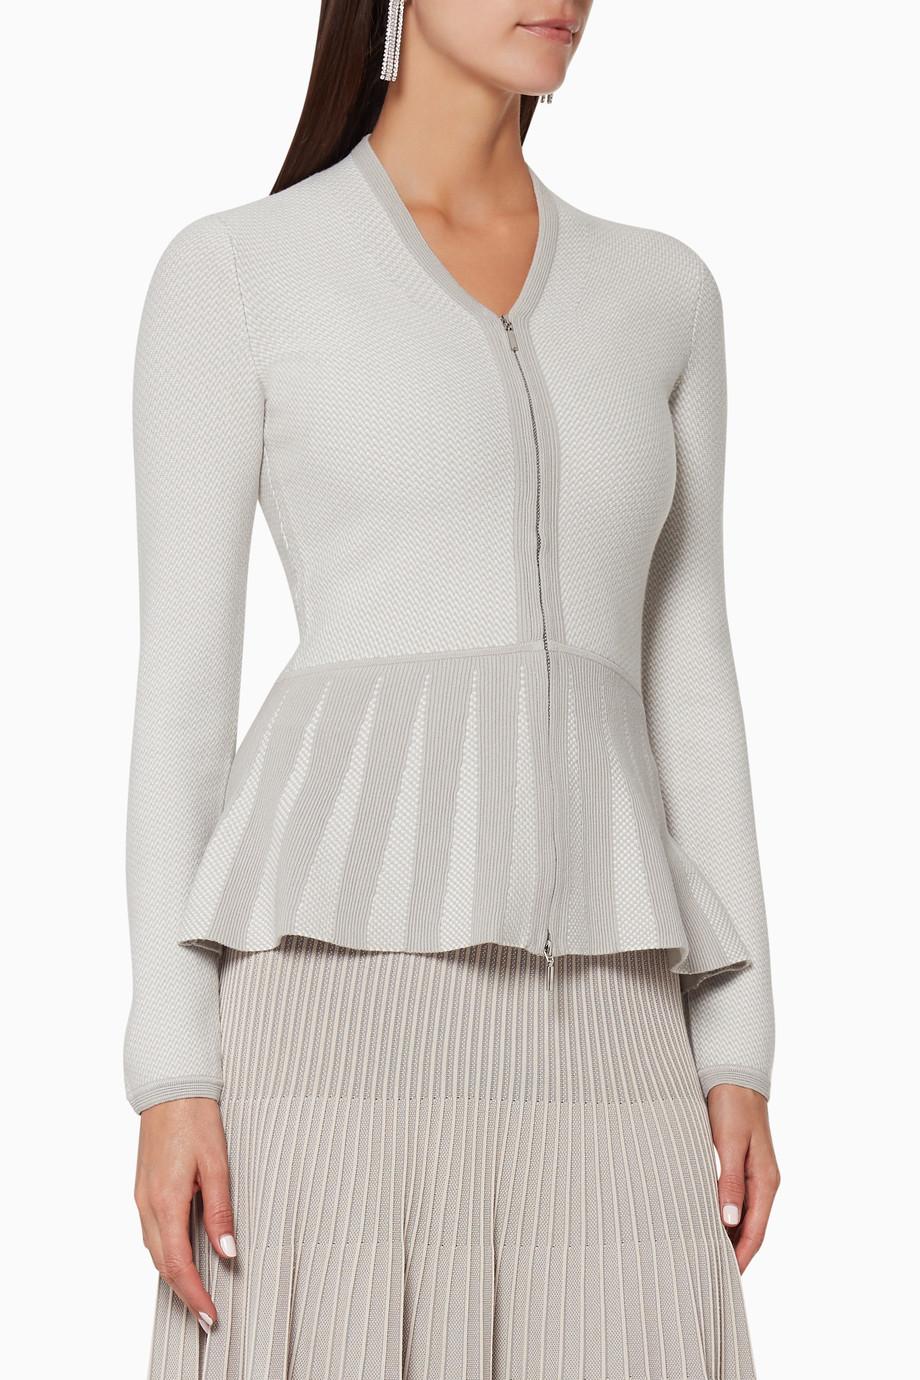 bf442cf1d5 Shop Emporio Armani Grey Knitted Peplum Jacket for Women | Ounass